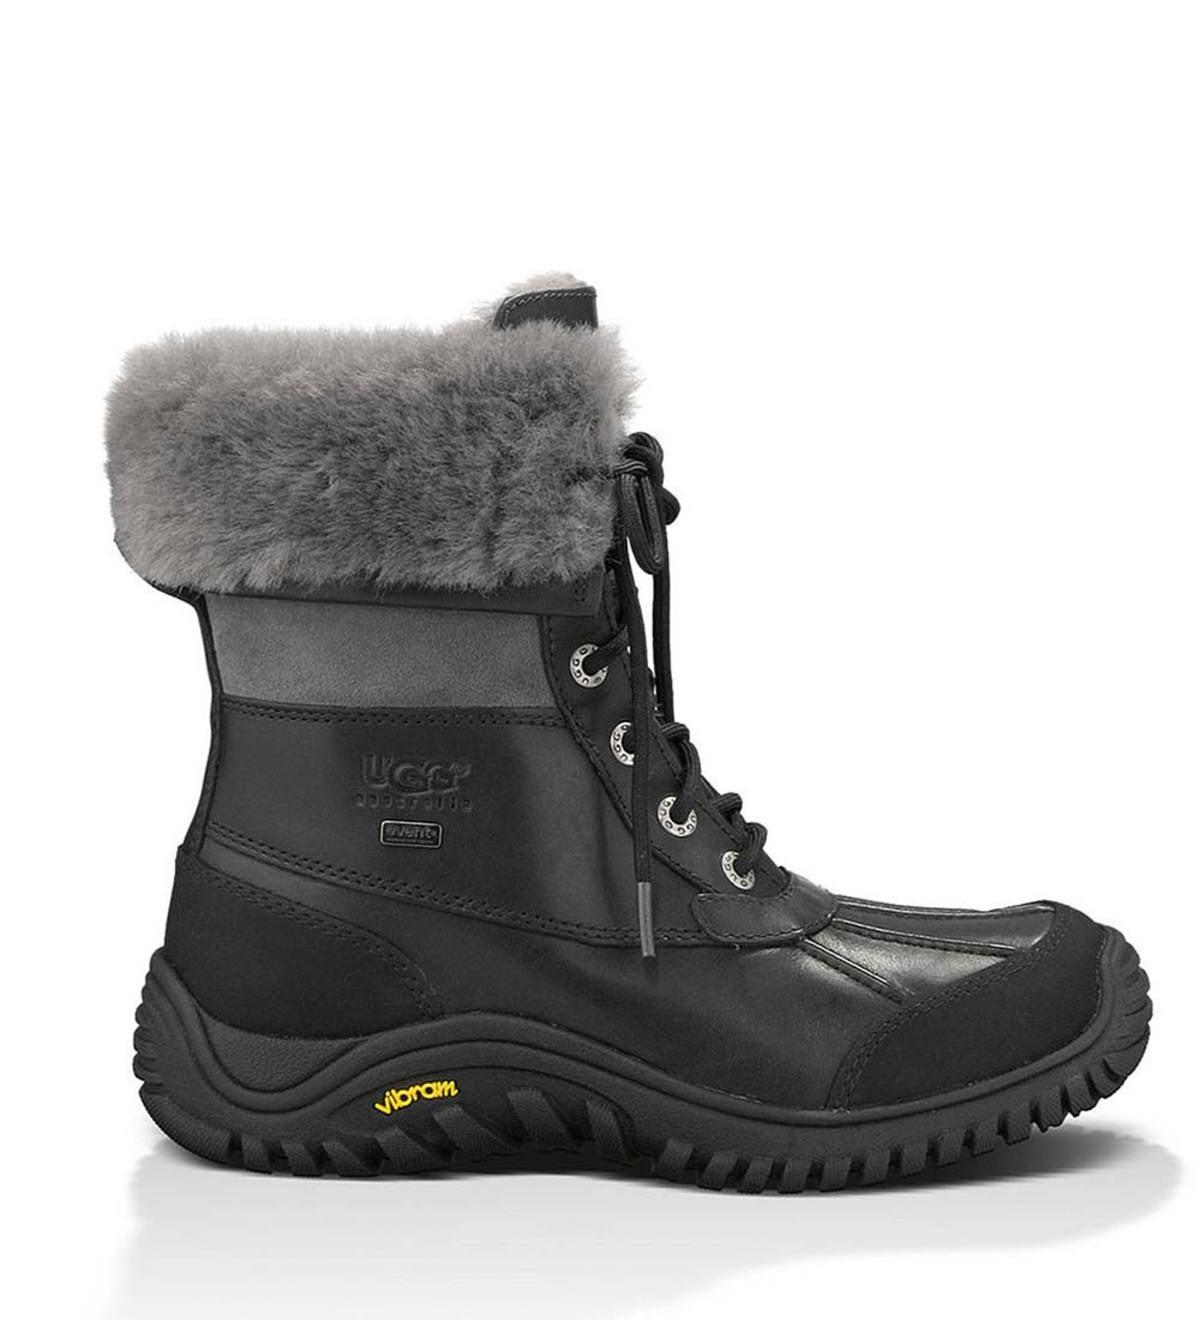 5795de2b920 Sale UGG Australia Women's Adirondack II Boots | PlowHearth